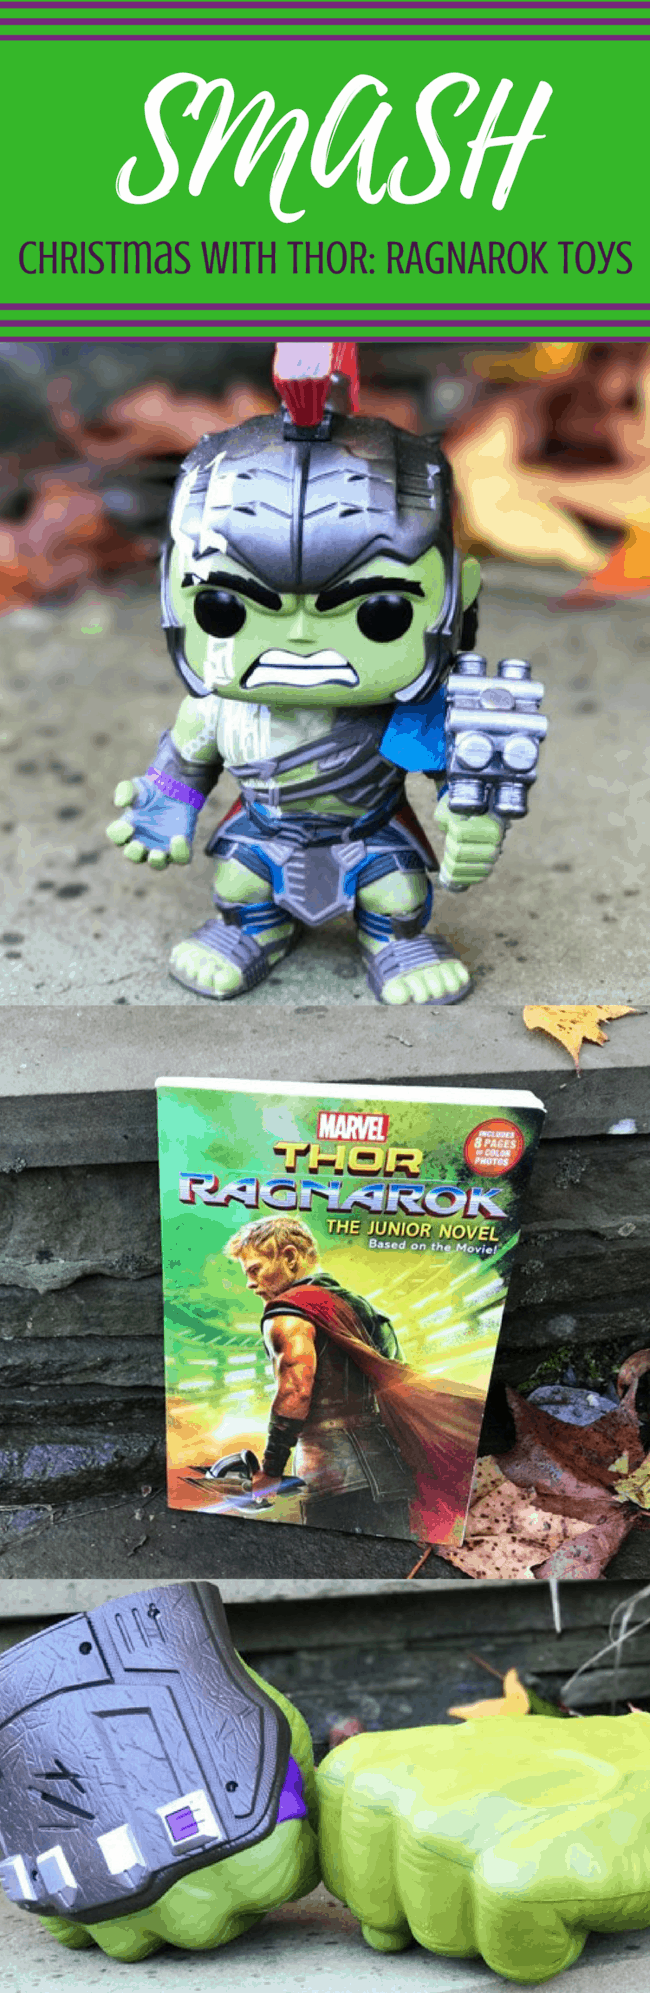 THOR: RAGNAROK toys for Christmas for the Marvel fan on your list! HULK | THOR | HELA | LOKI